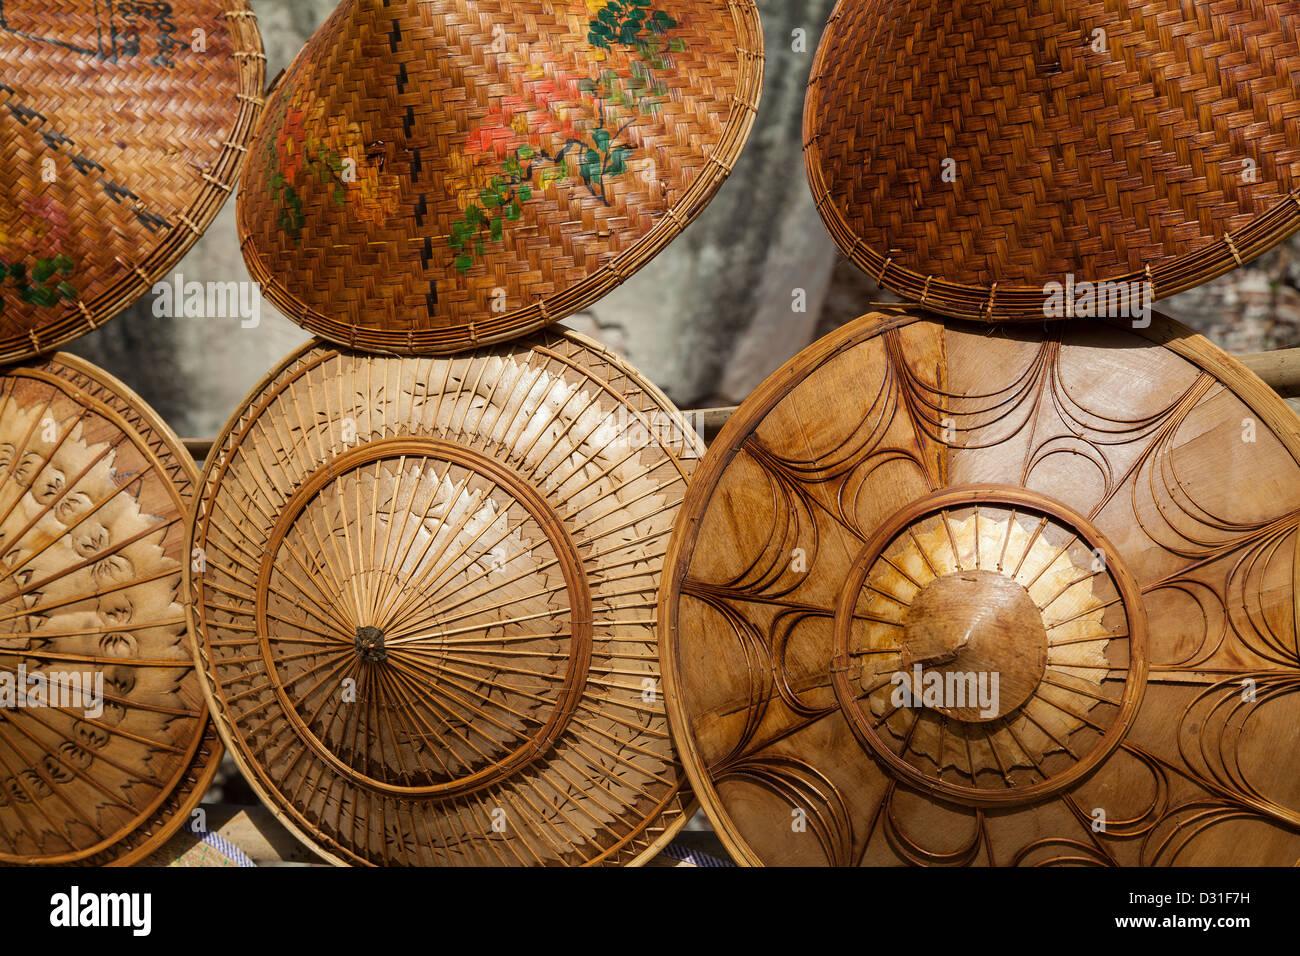 Myanmar, the market, typical headdress - Stock Image